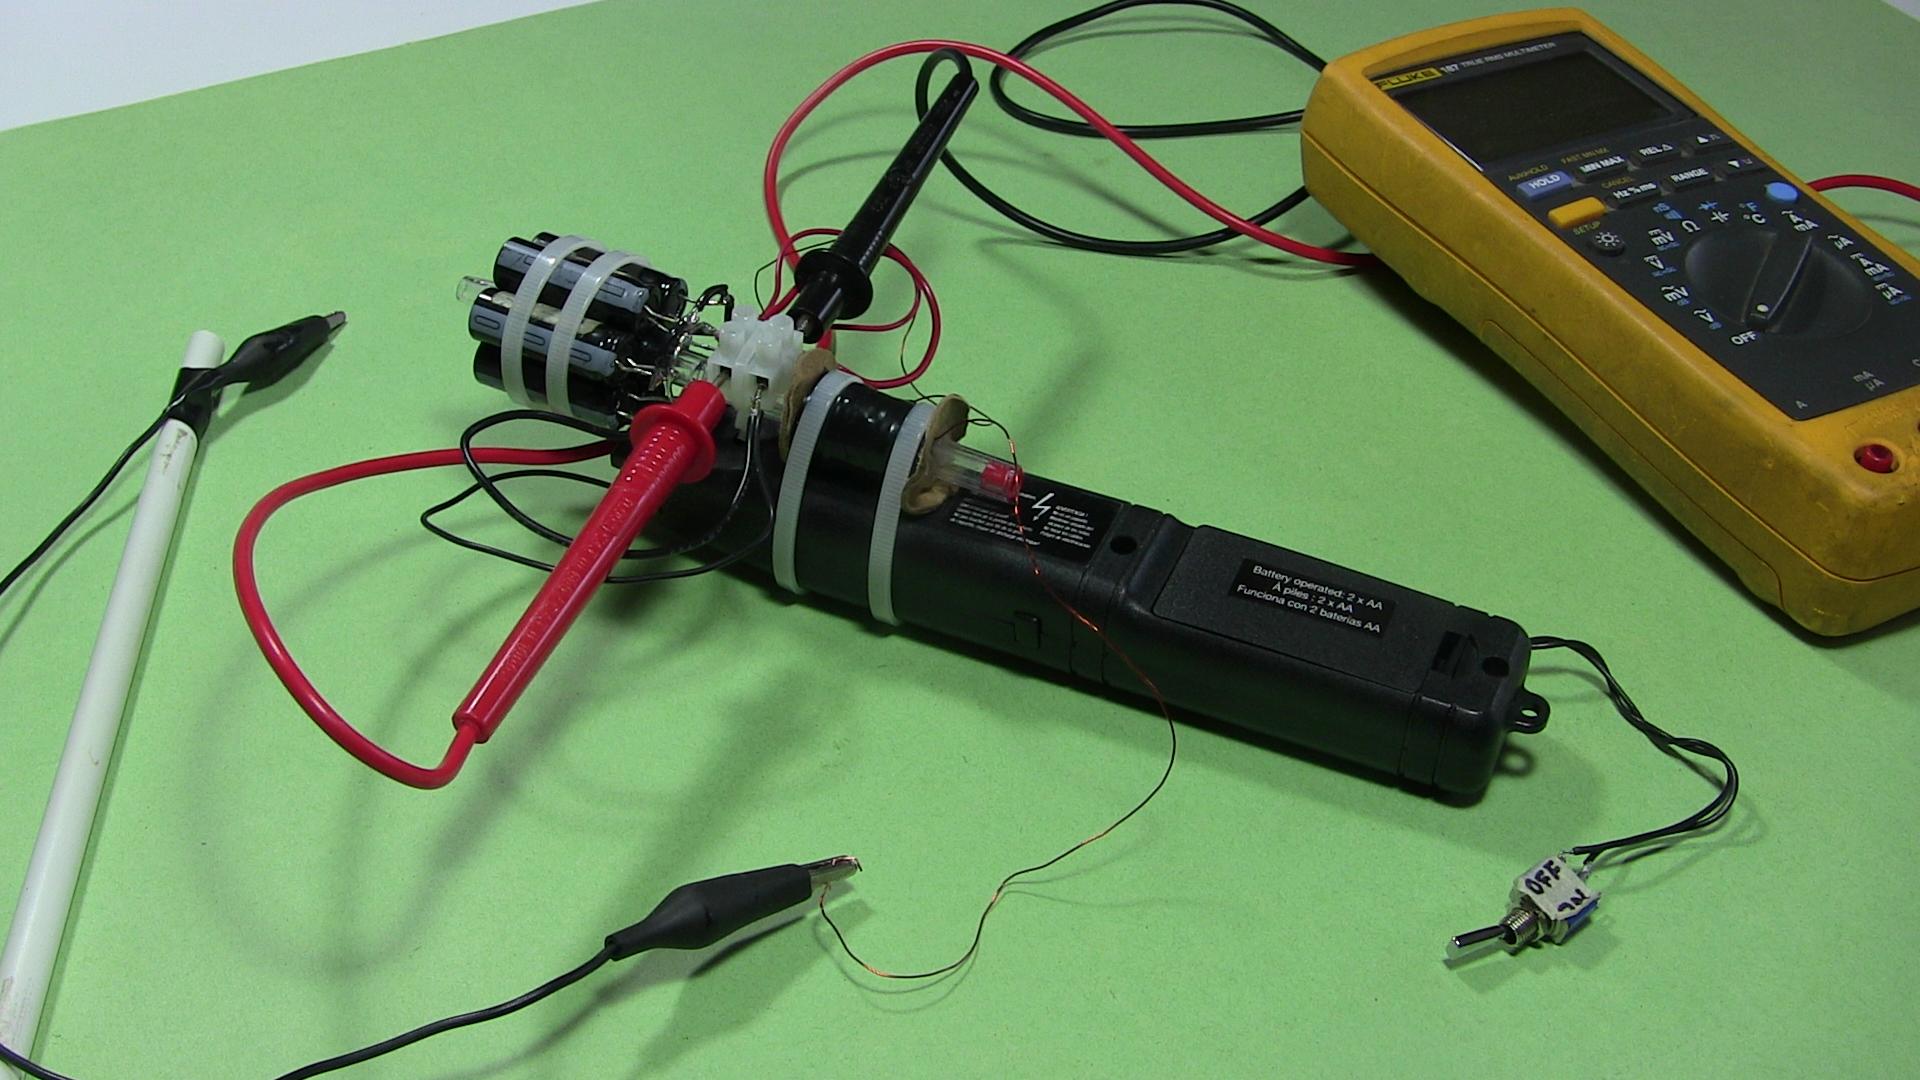 How To Make A Coil Gun Electronic Schematics The Best Car Hd Wallpaper Diy Electronics Closeup